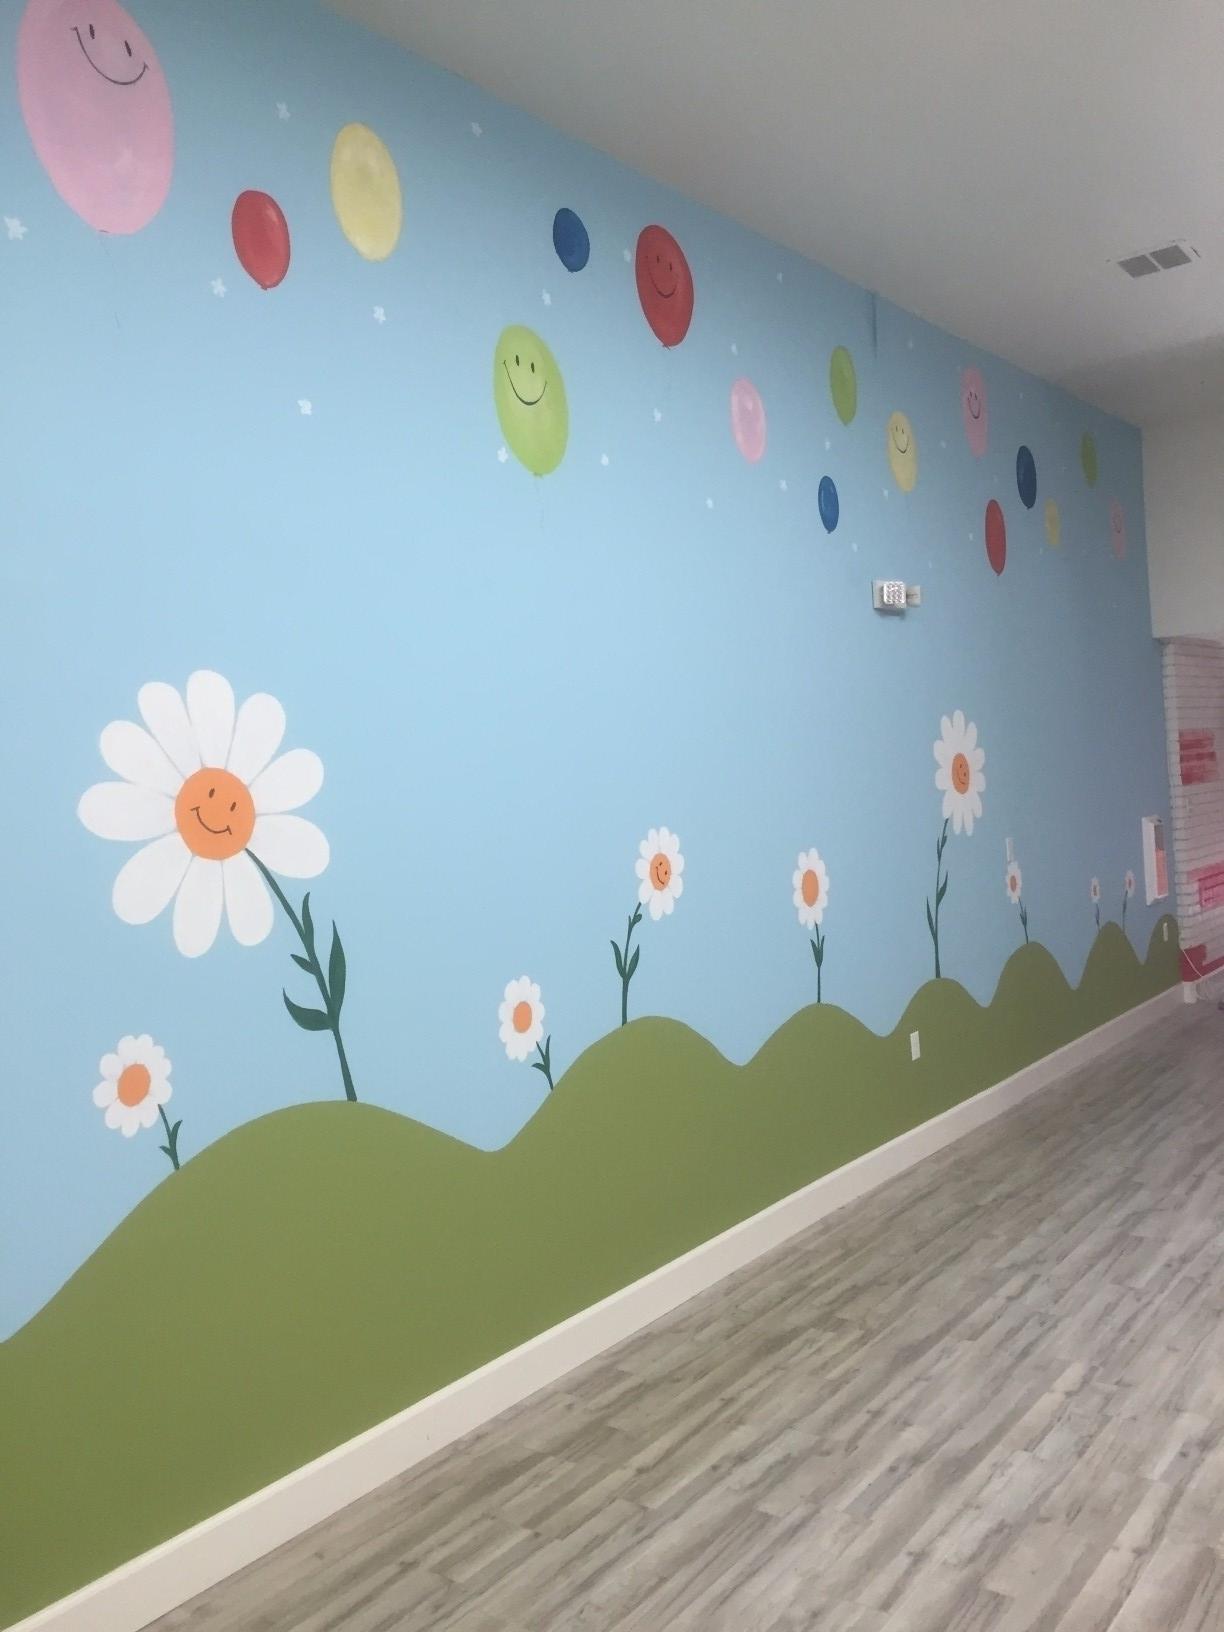 Childrens Bedroom Mural Artist Laroyalart 3